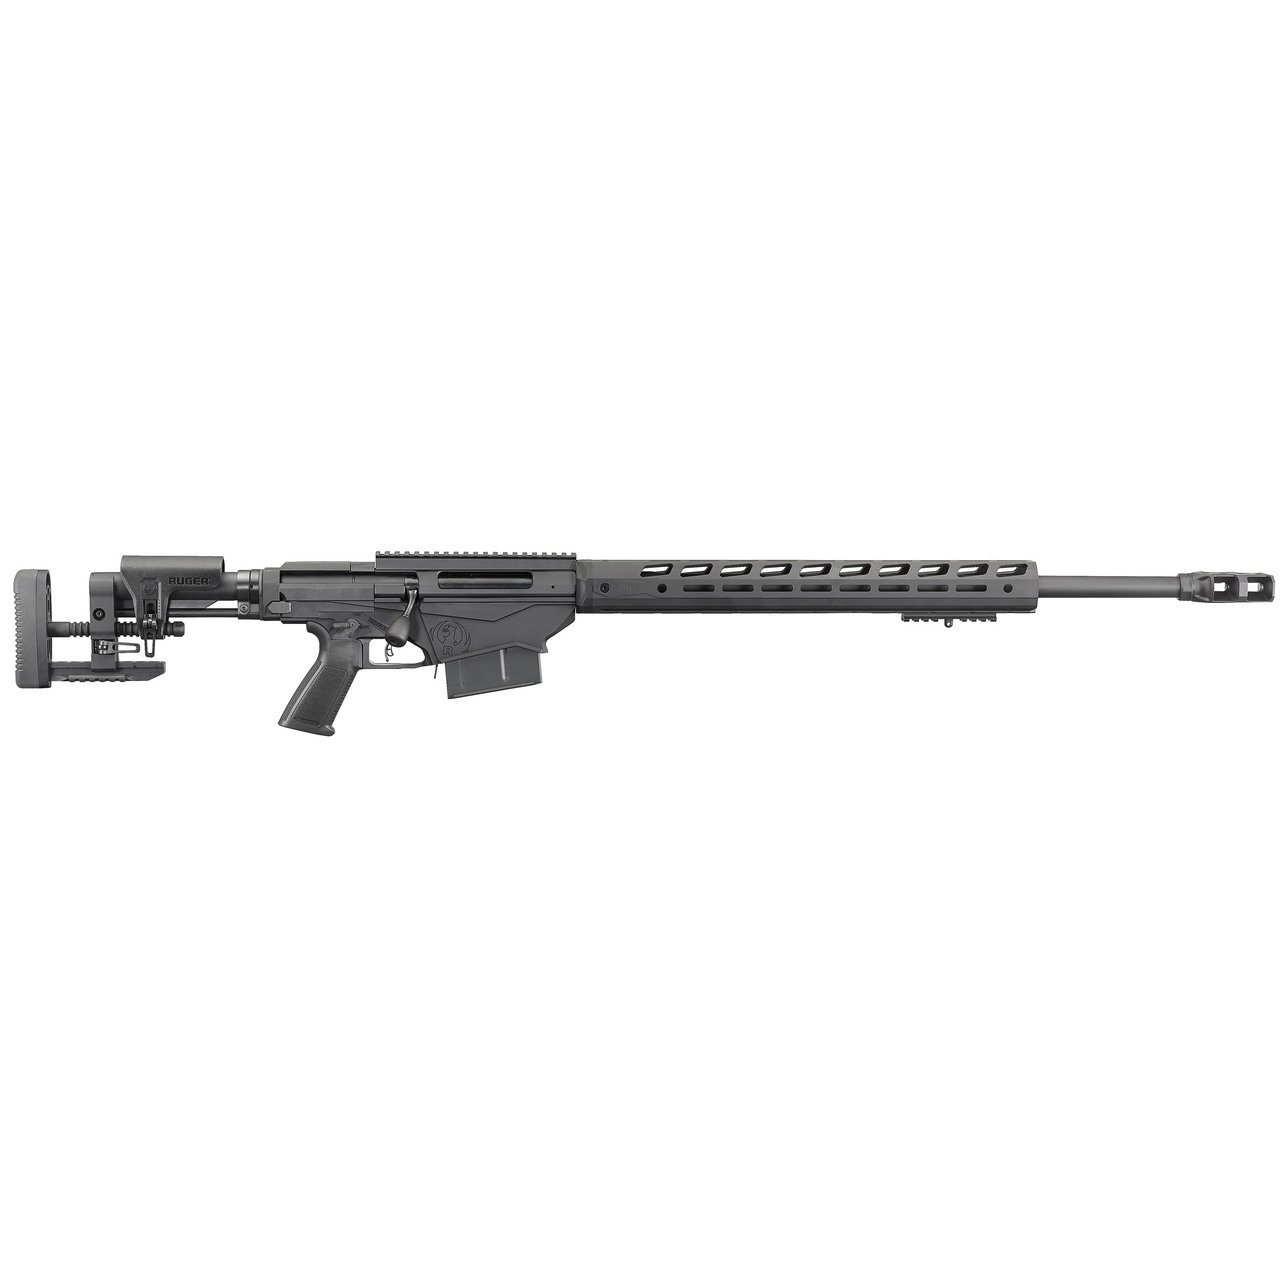 Ruger Precision Rifle, 338 Lapua